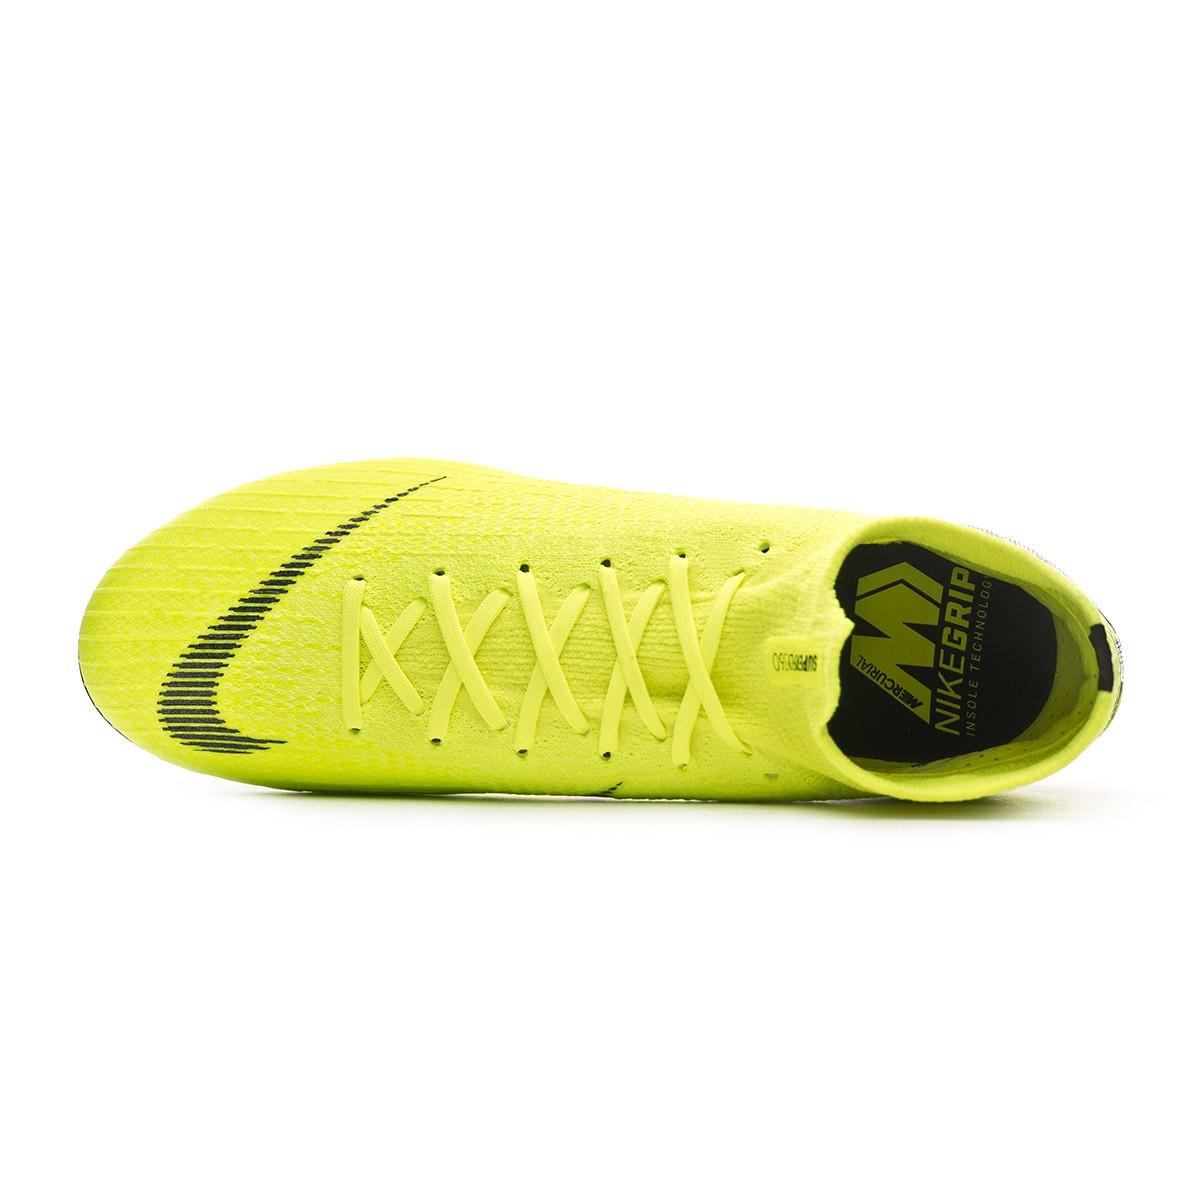 509853df5 Football Boots Nike Mercurial Superfly VI Elite FG Volt-Black - Tienda de  fútbol Fútbol Emotion